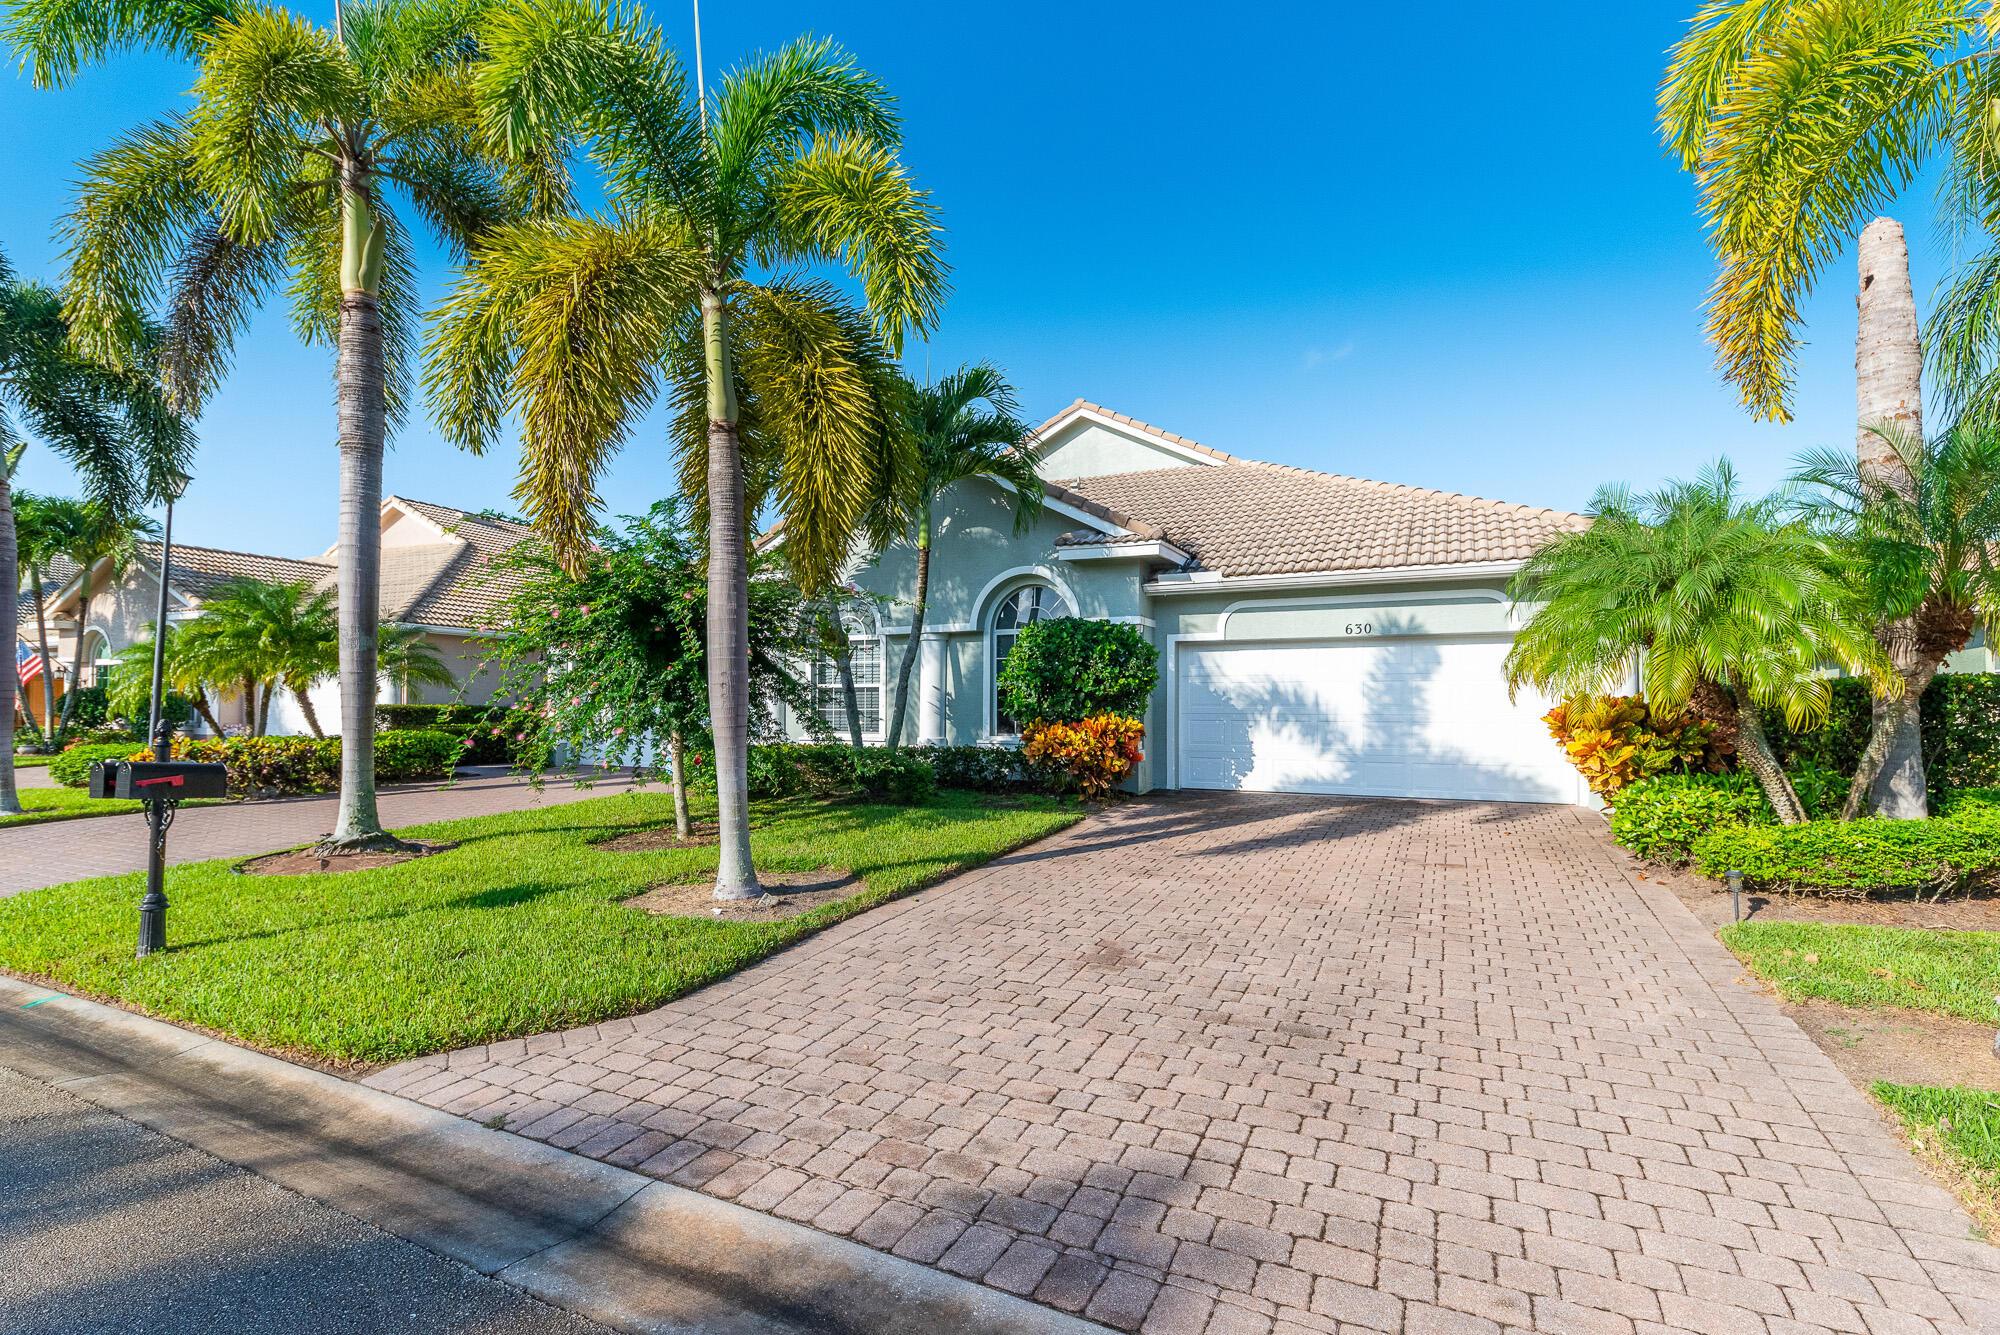 Home for sale in Jensen Beach Country Club Jensen Beach Florida